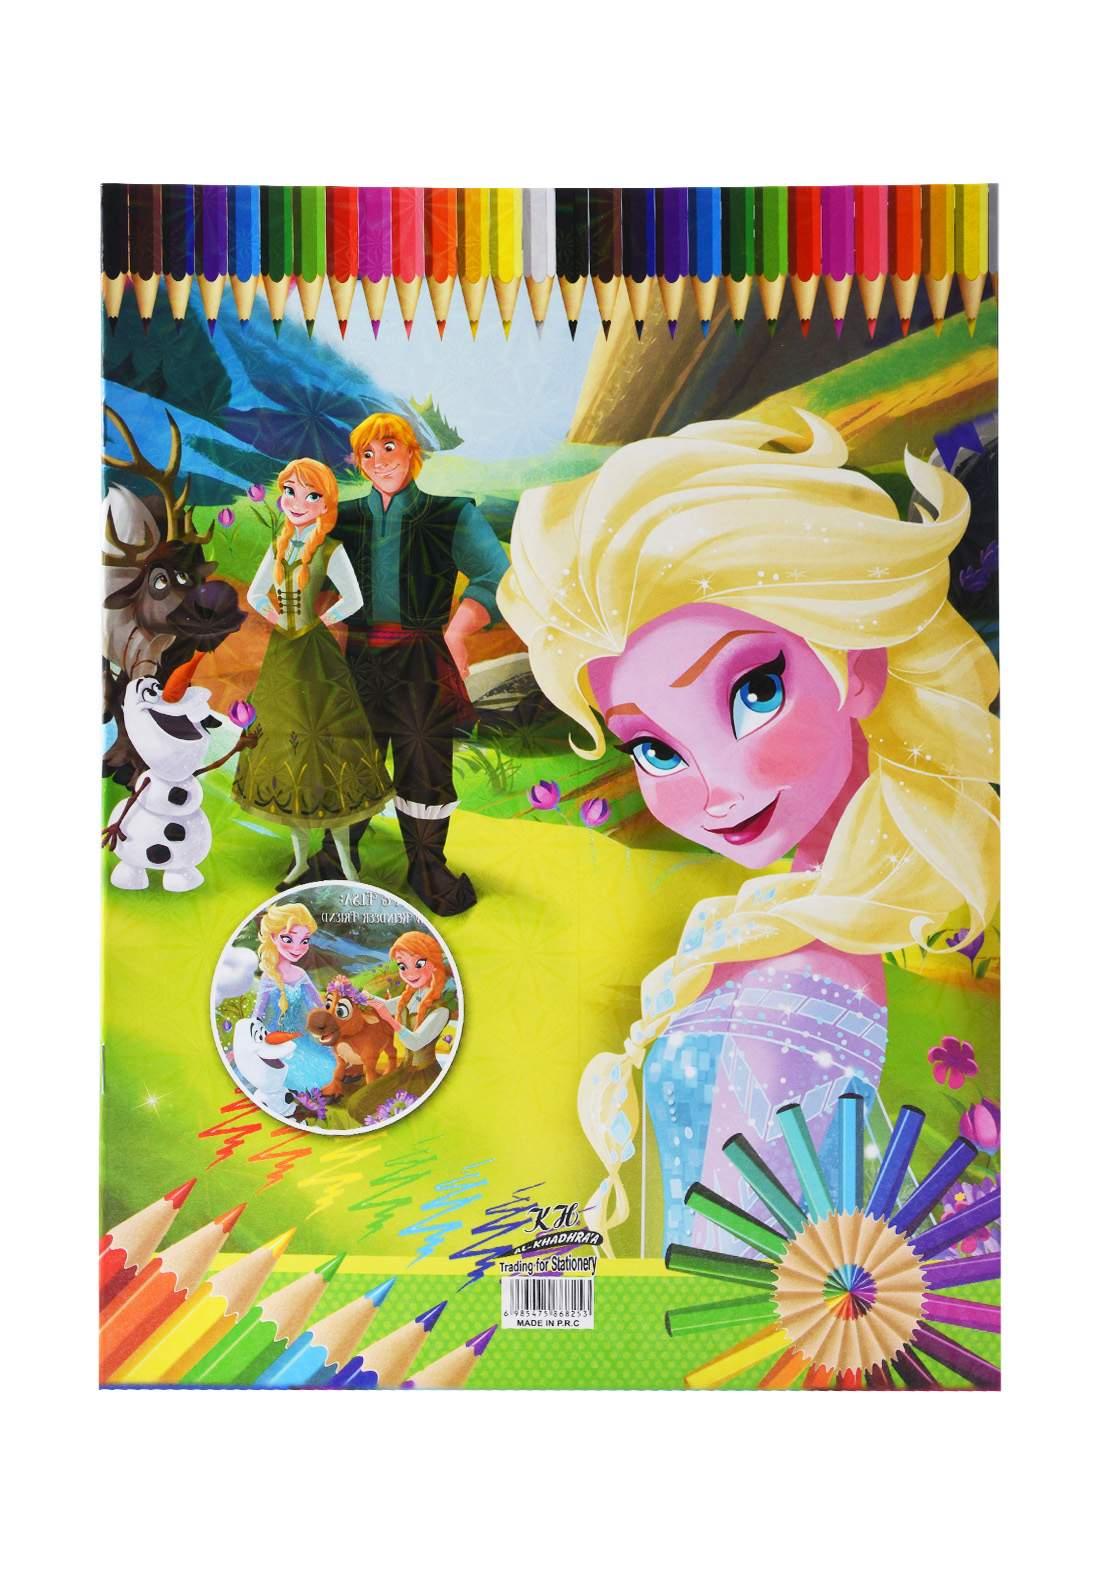 دفتر رسم 20 ورقة برسمة Frozen KH-20